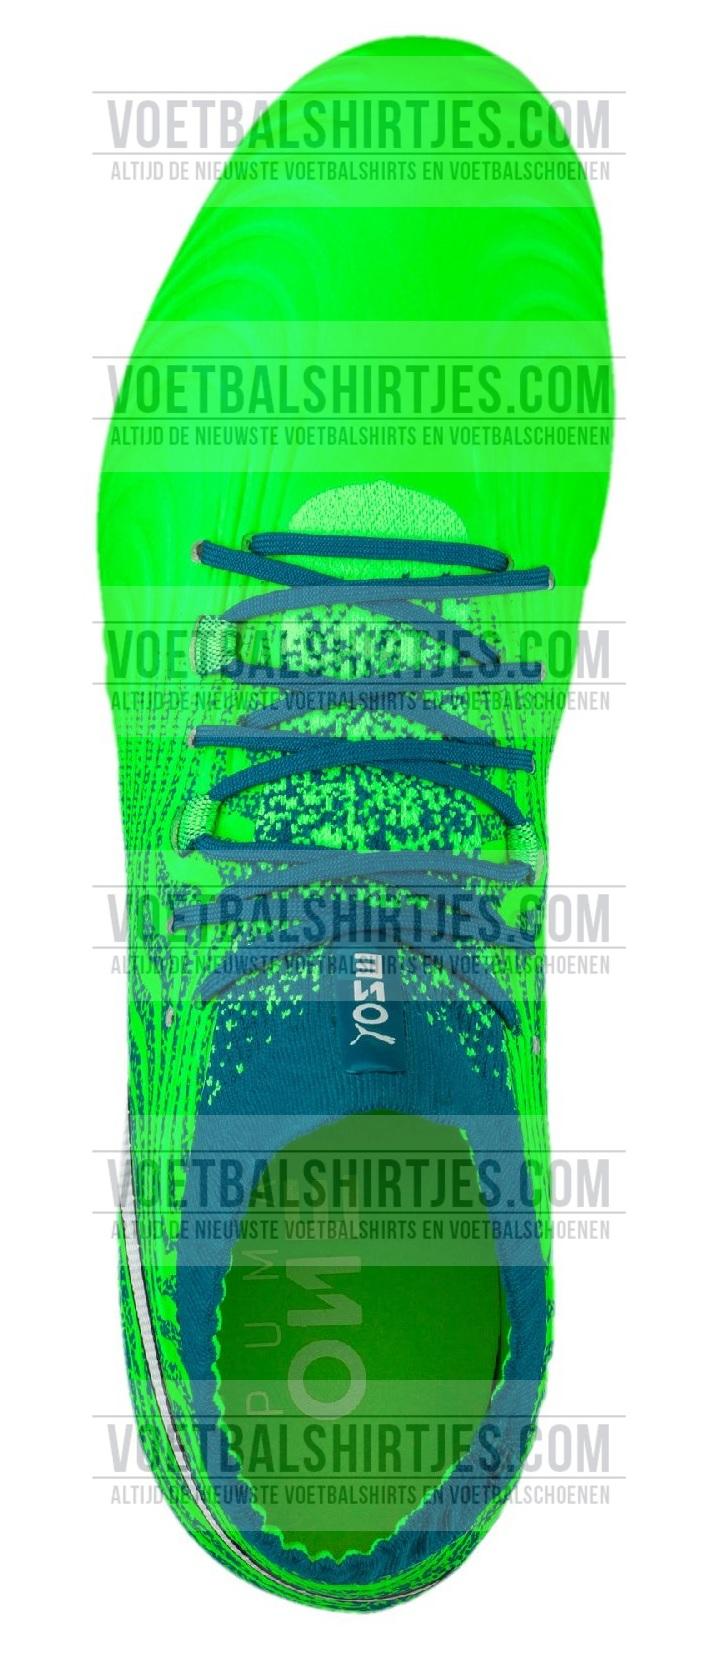 puma one 18.1 voetbalschoenen groen